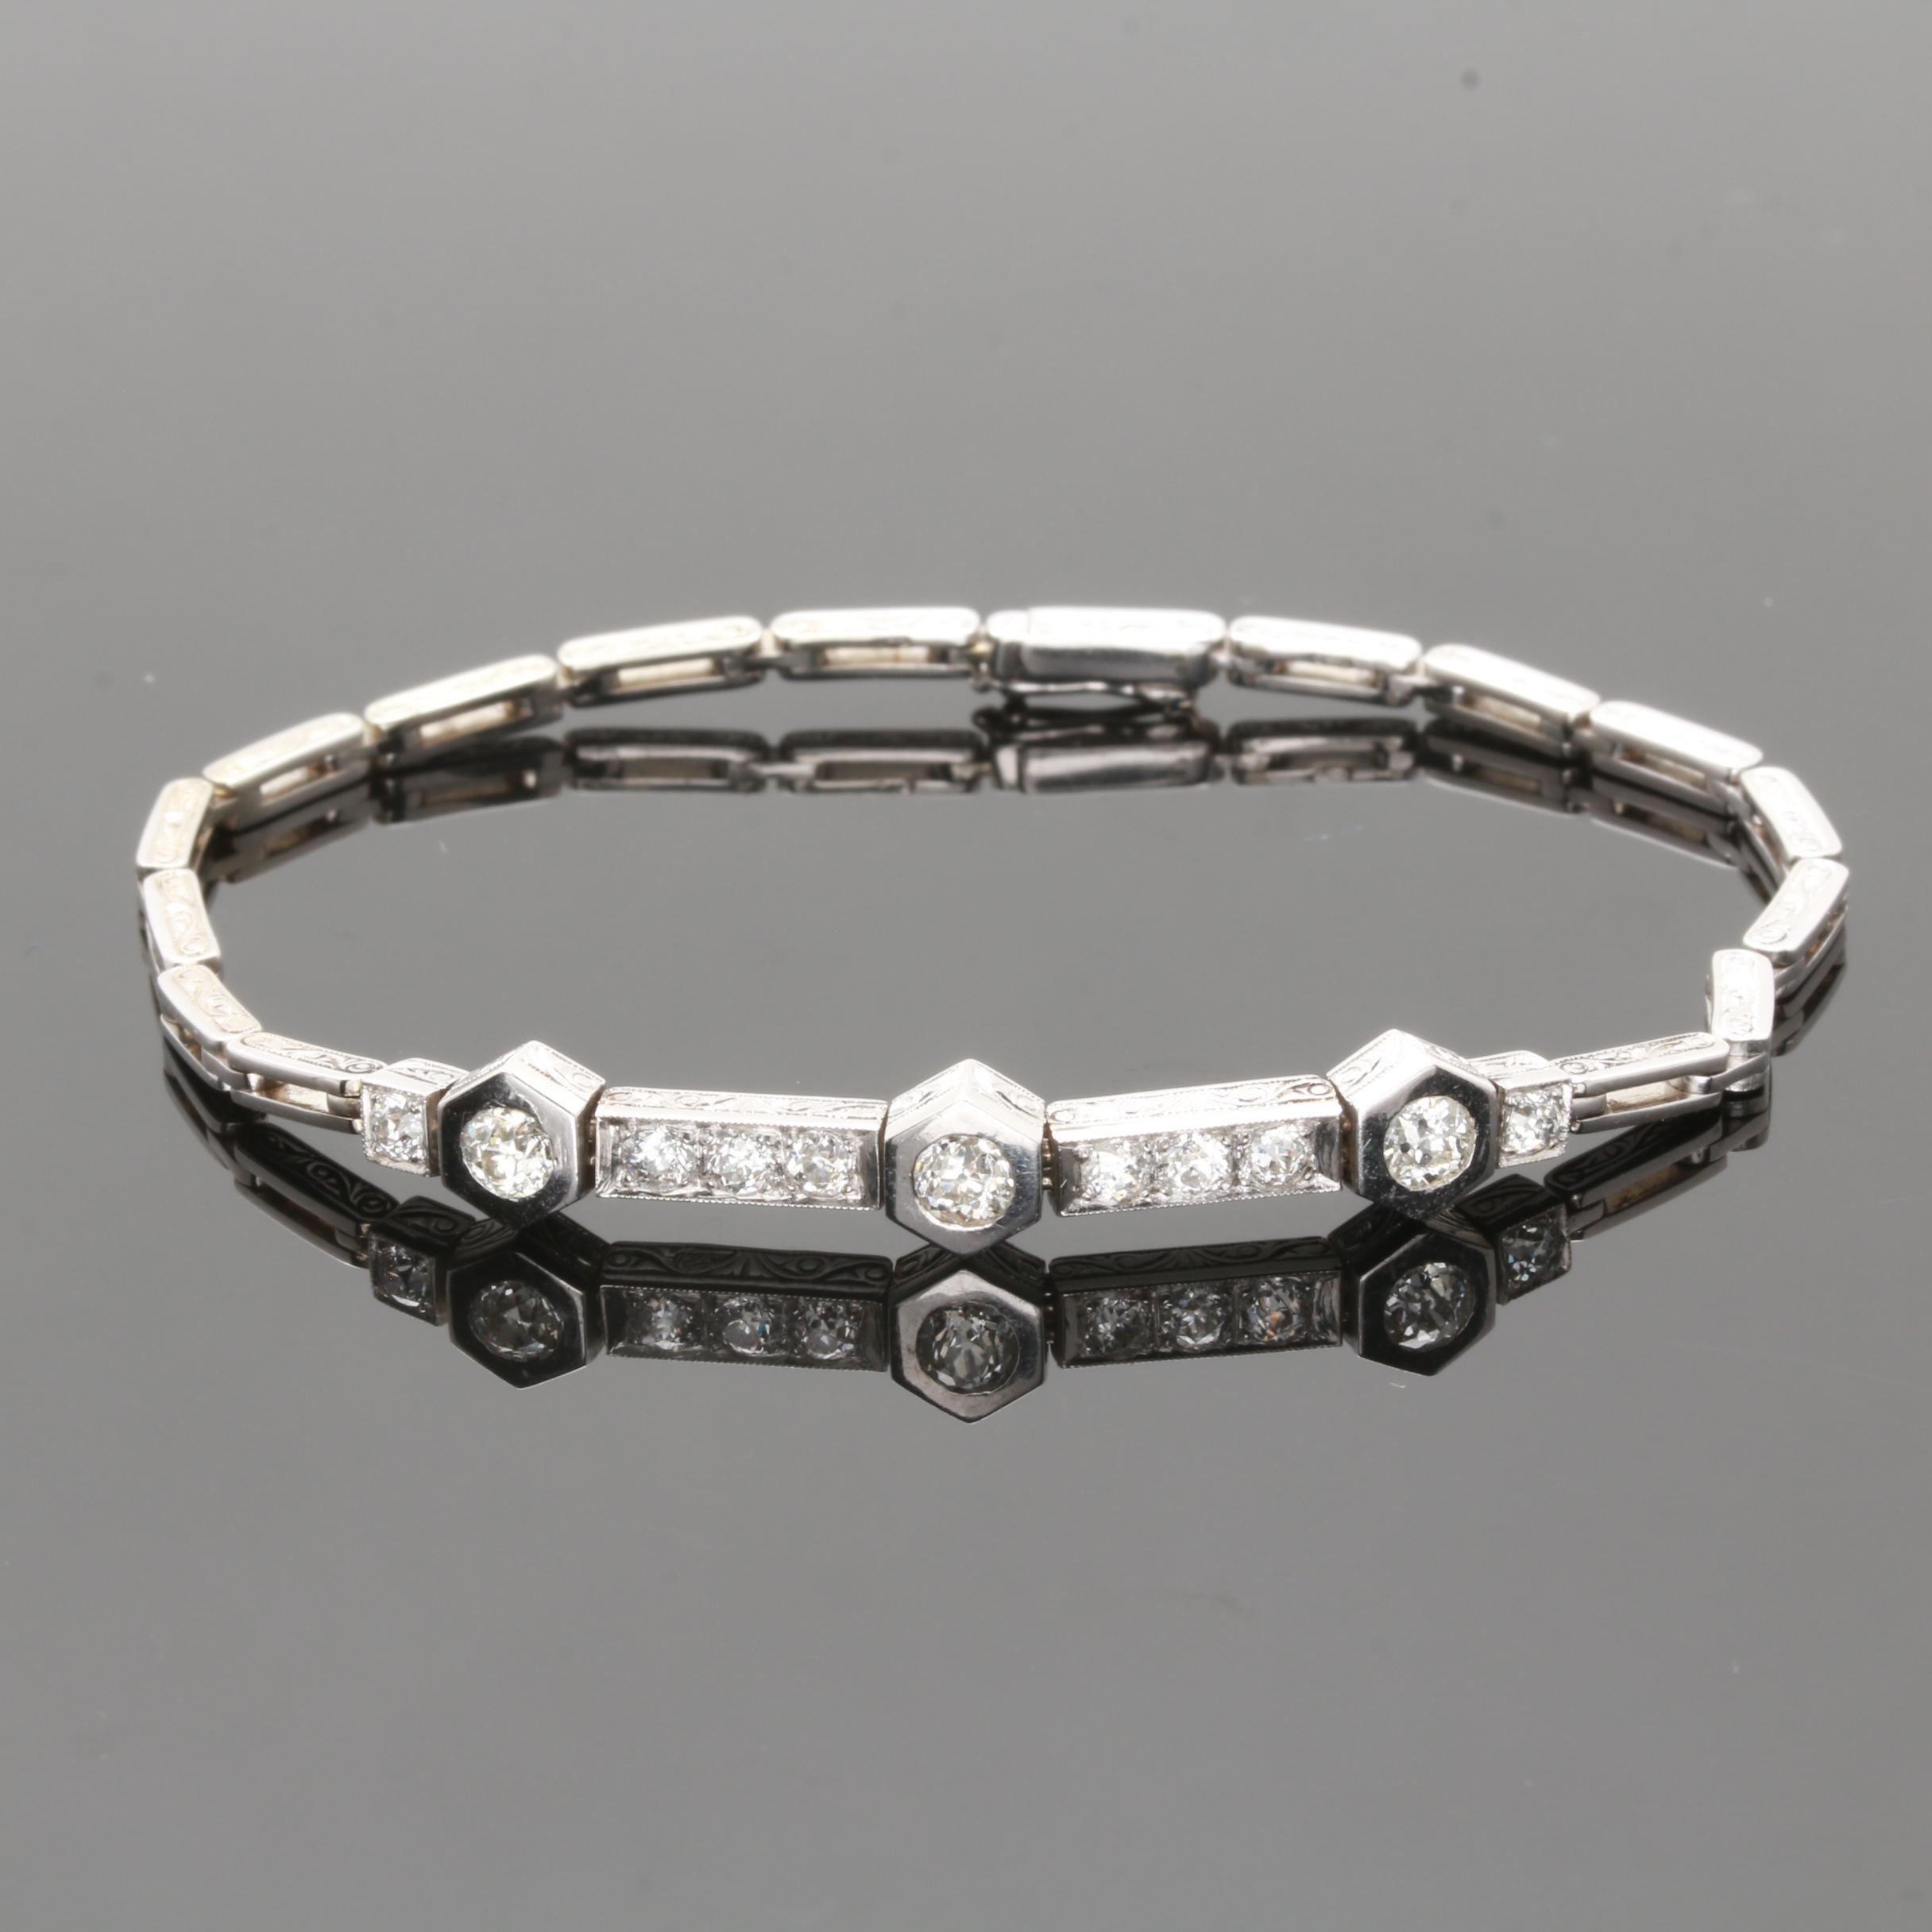 Vintage 14K White Gold Diamond Bracelet